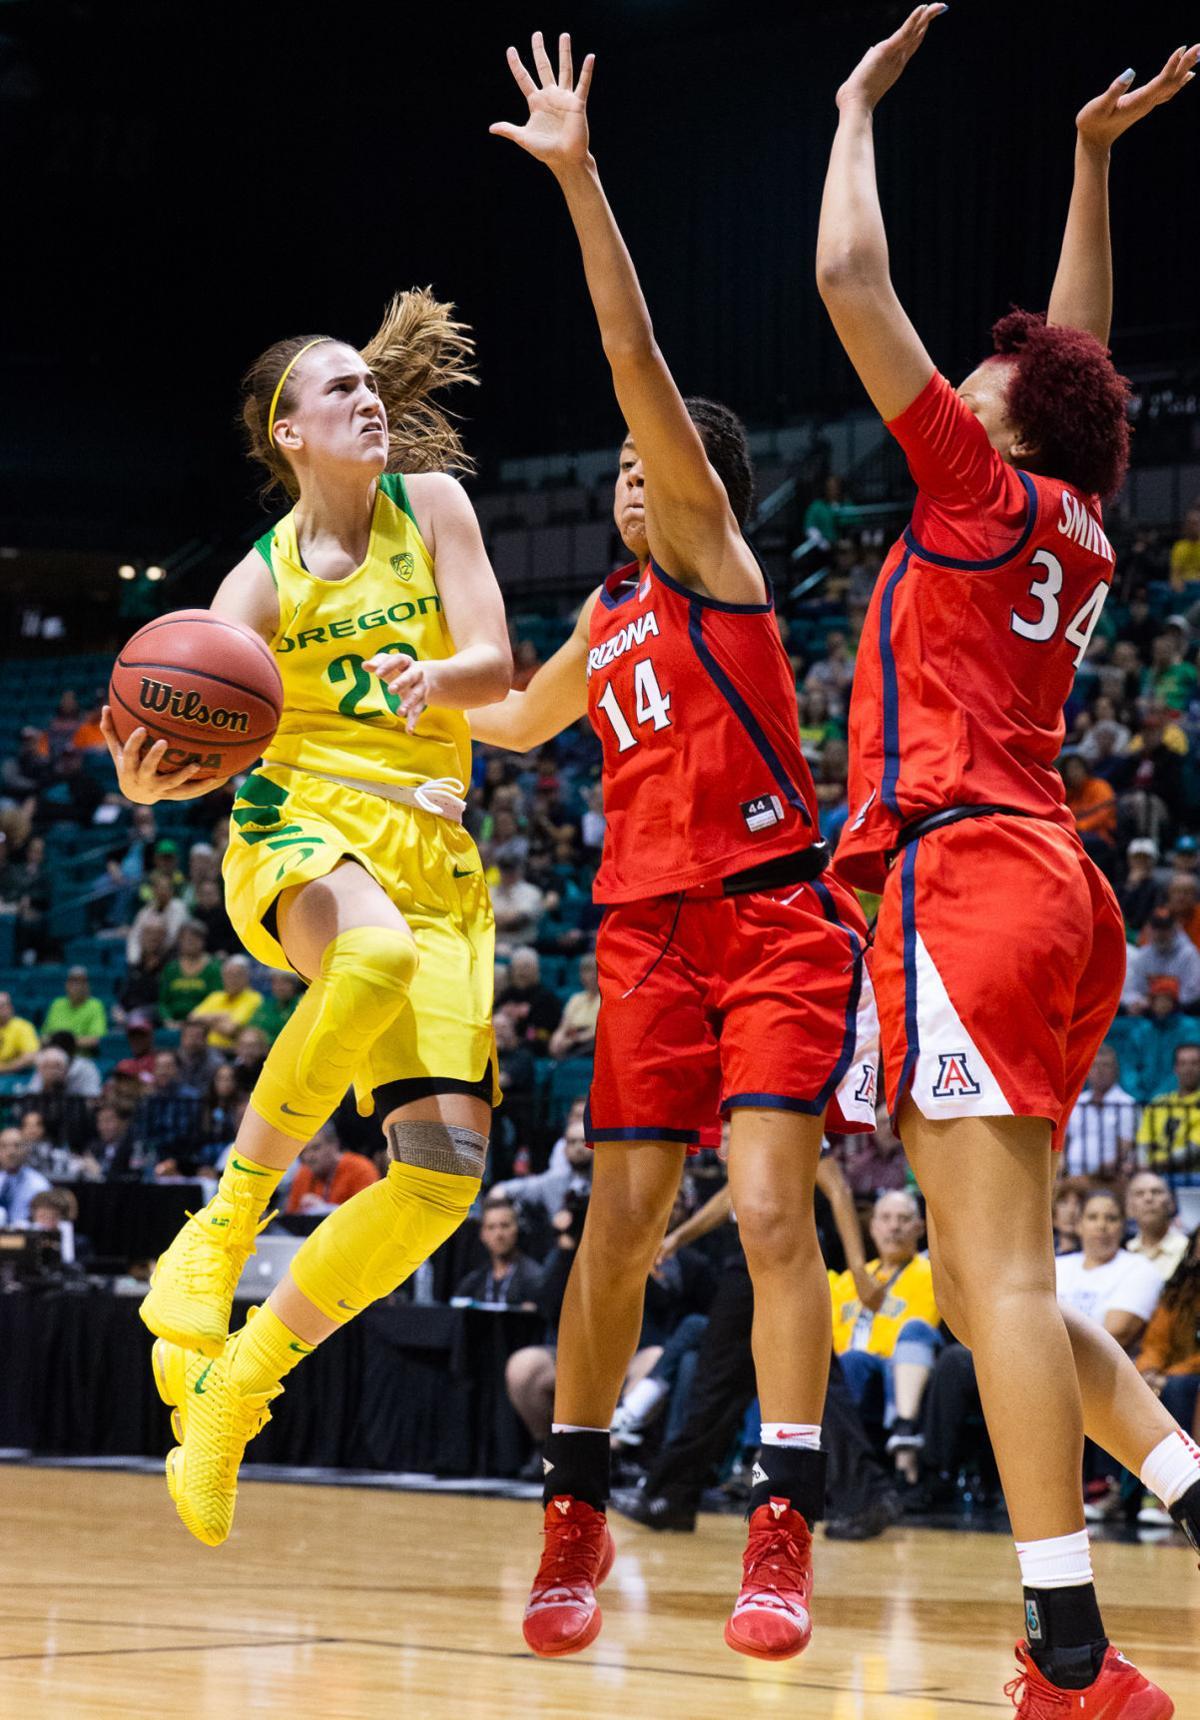 Oregon Arizona Pac-12 women's basketball